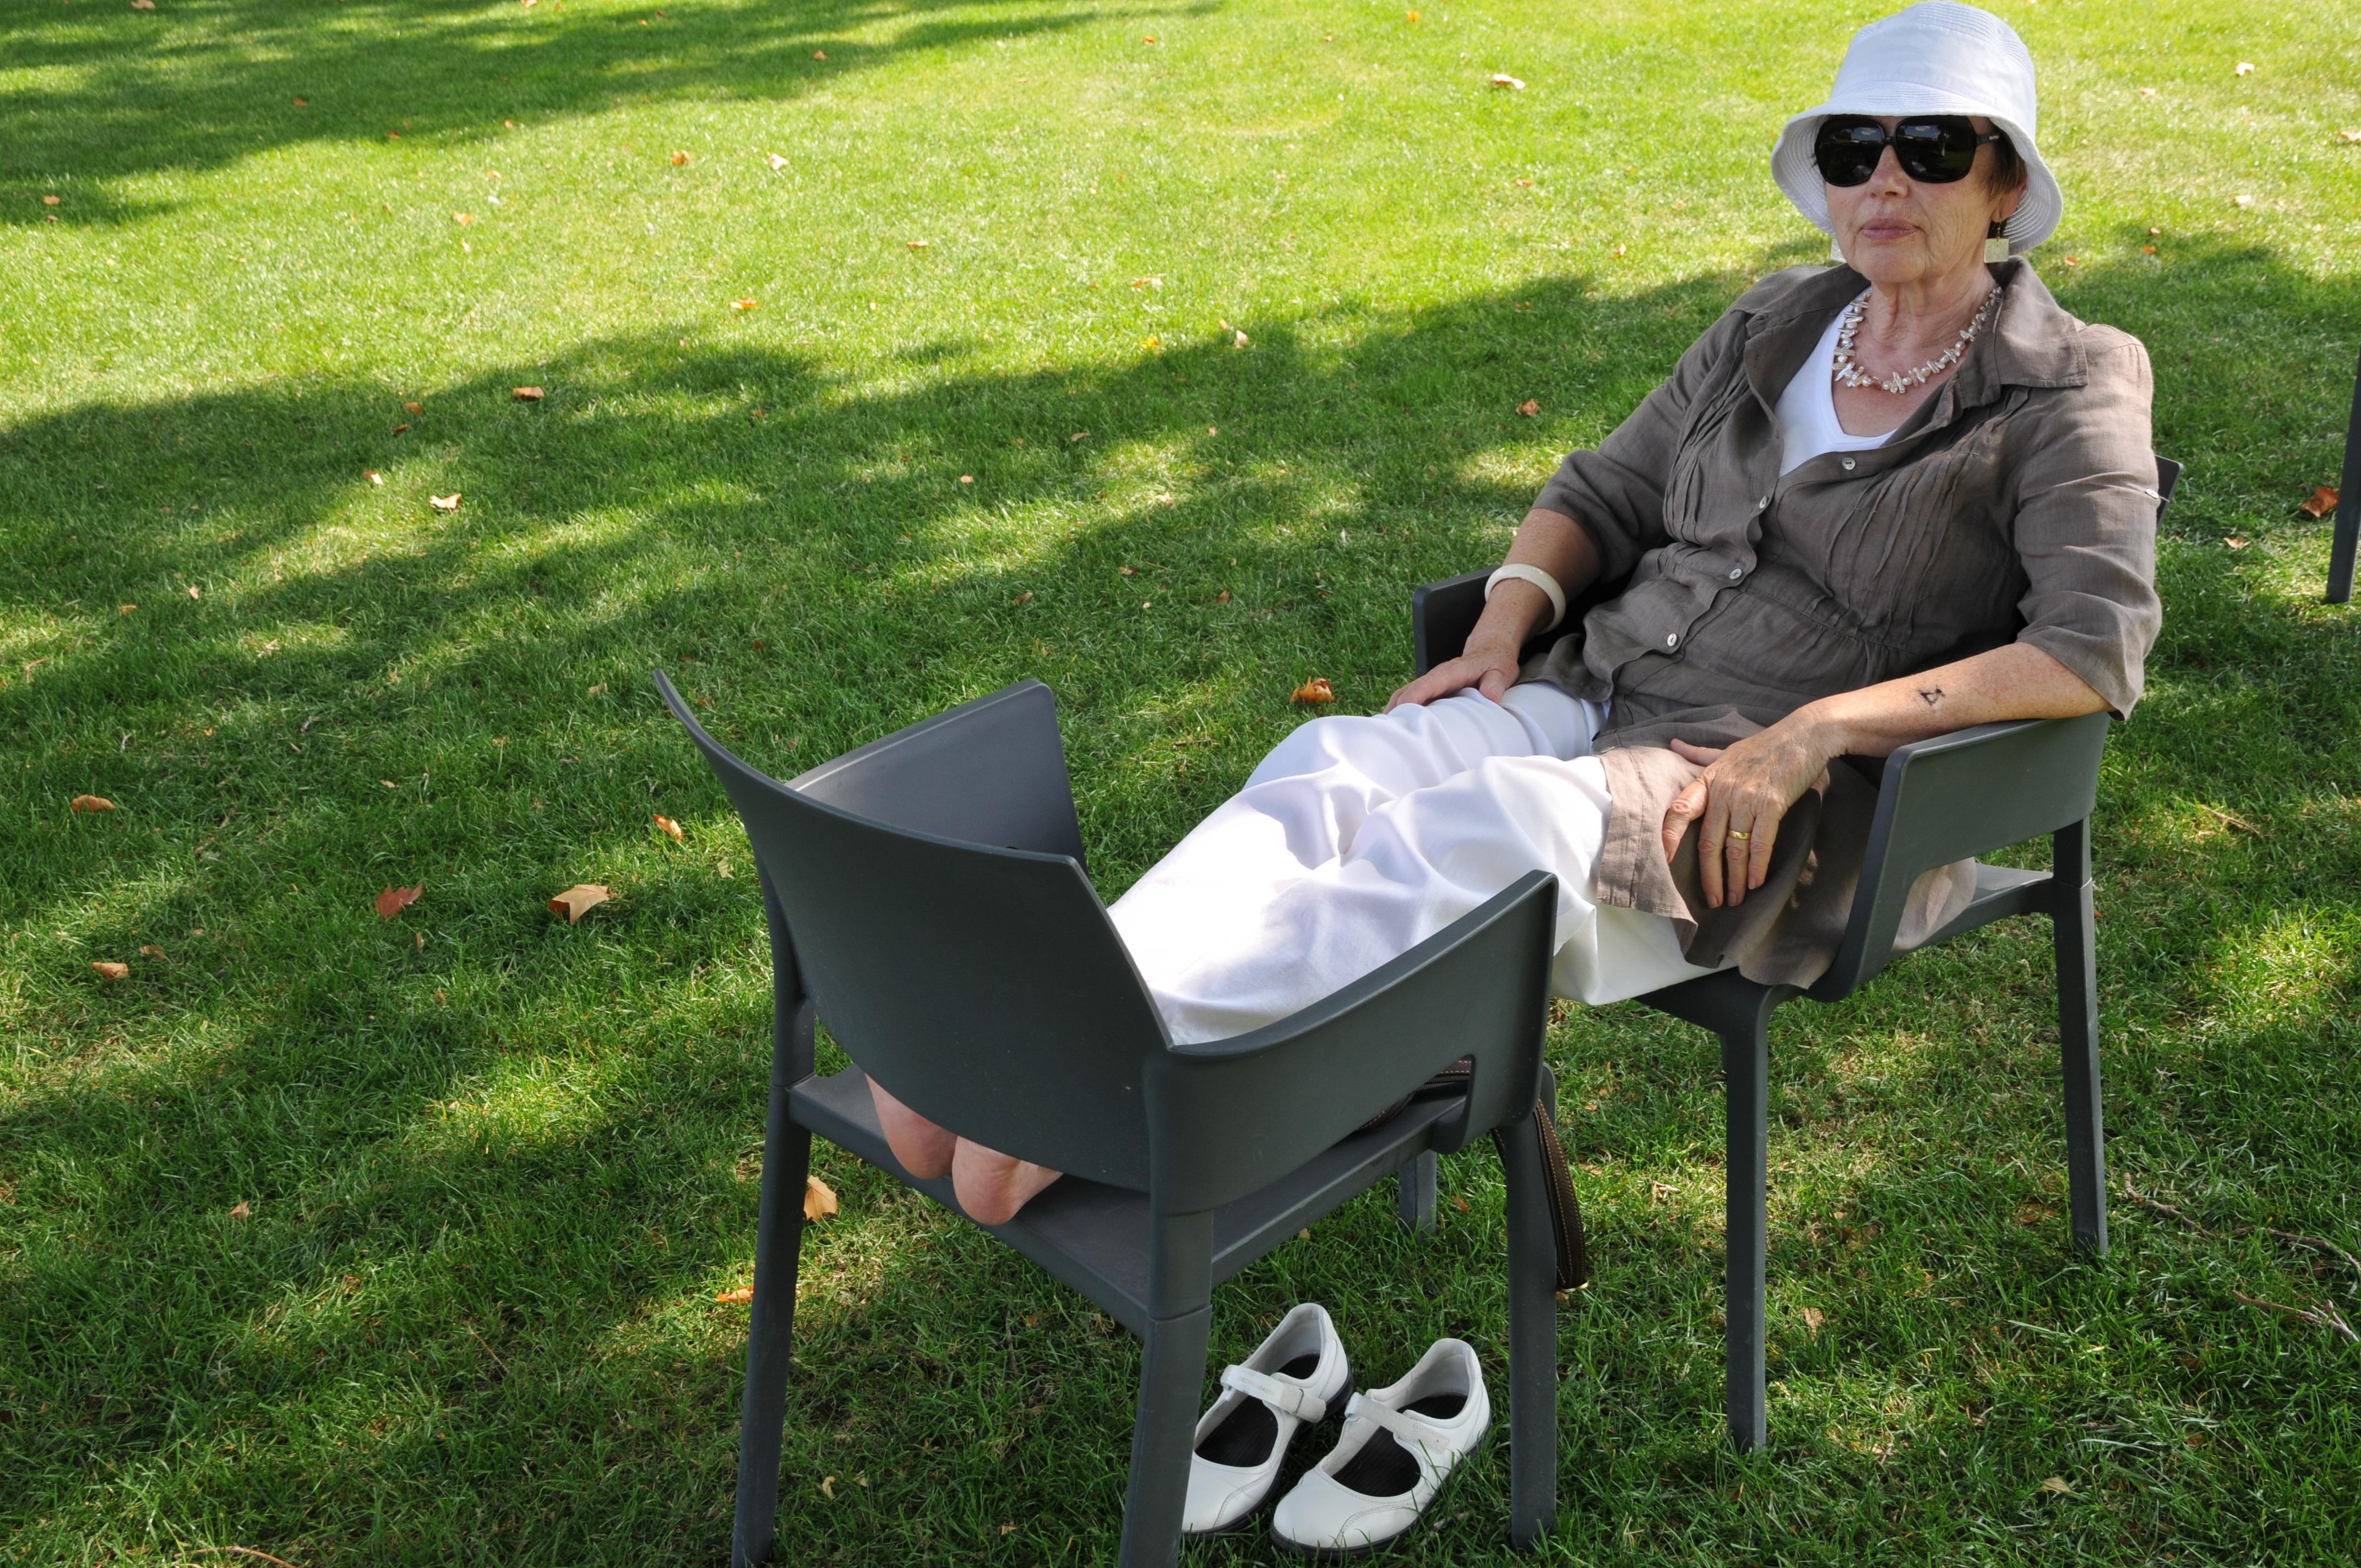 Free grass woman lawn chair summer sitting backyard